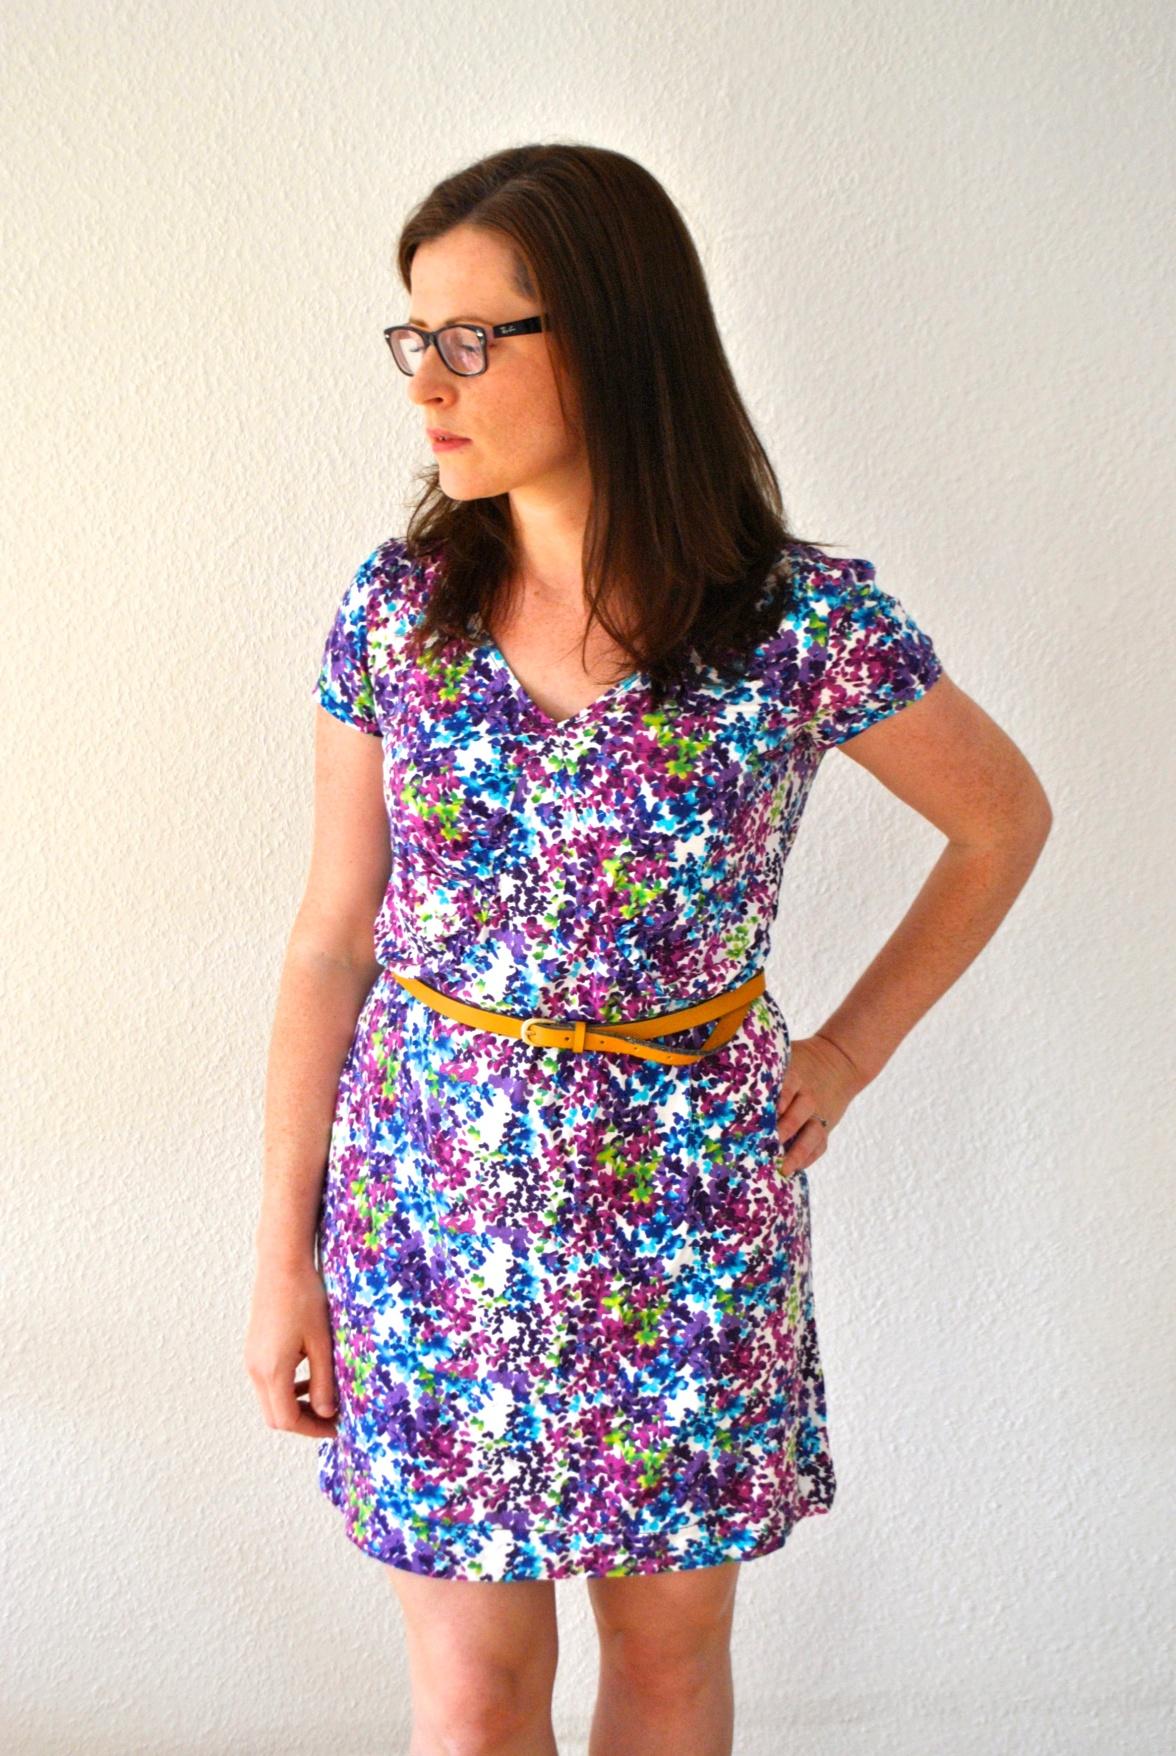 Jersey Burda Dress by knitahedron